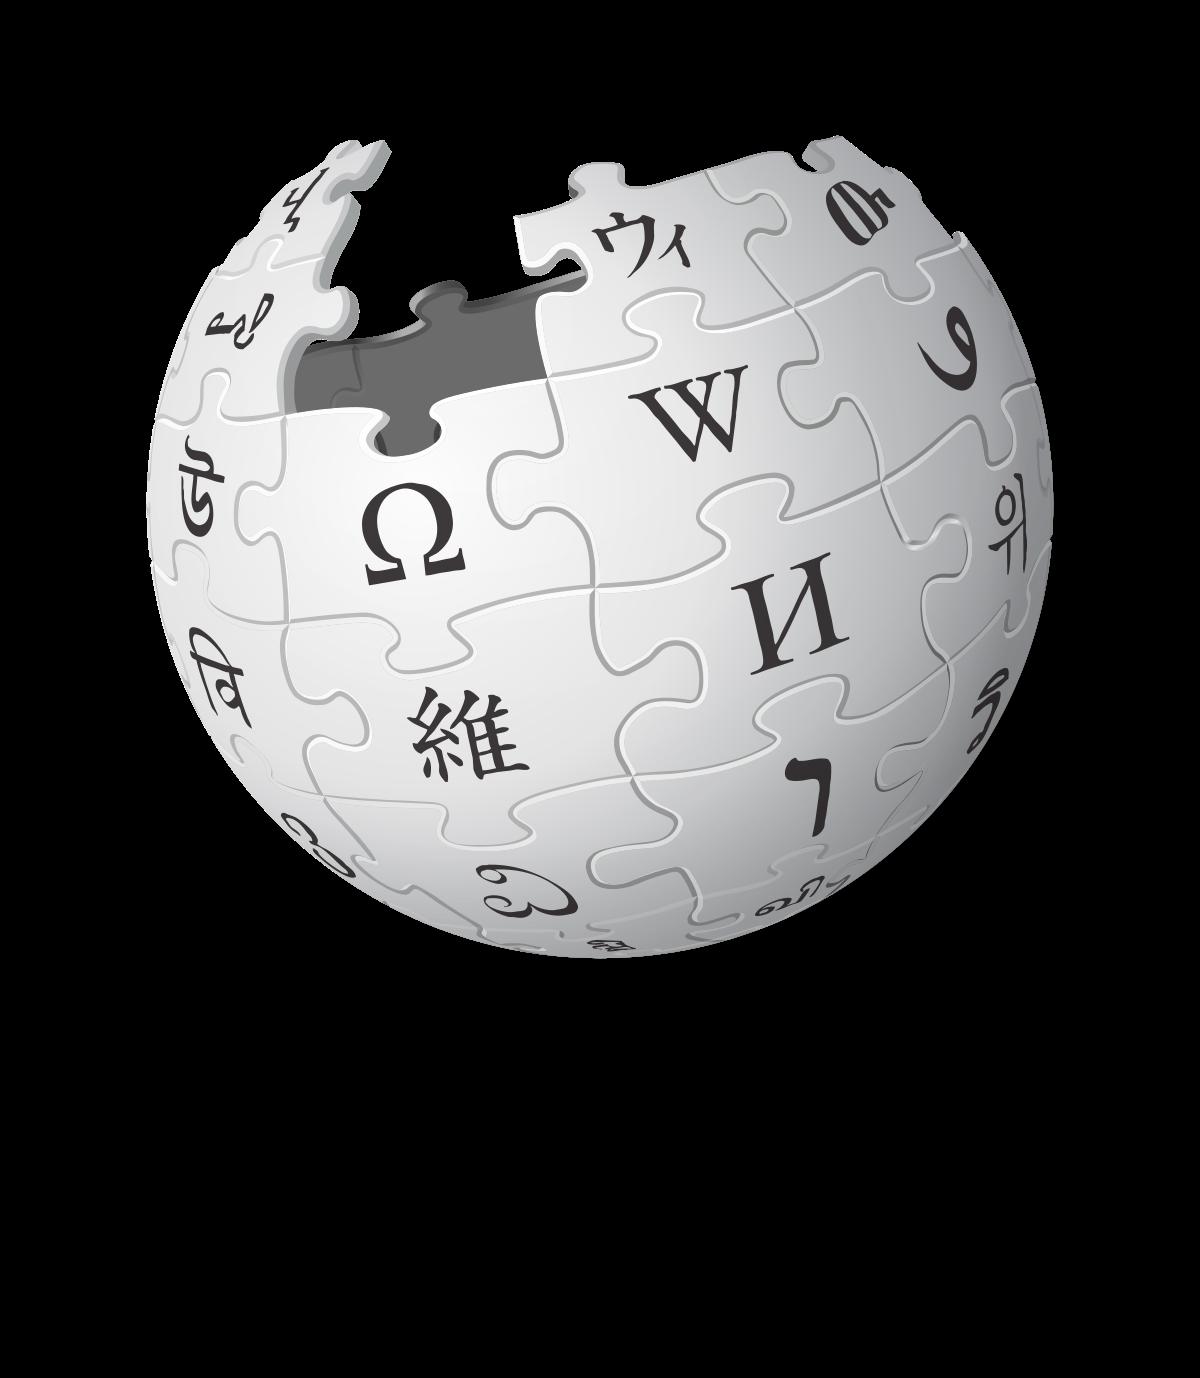 Wikipedijalogo